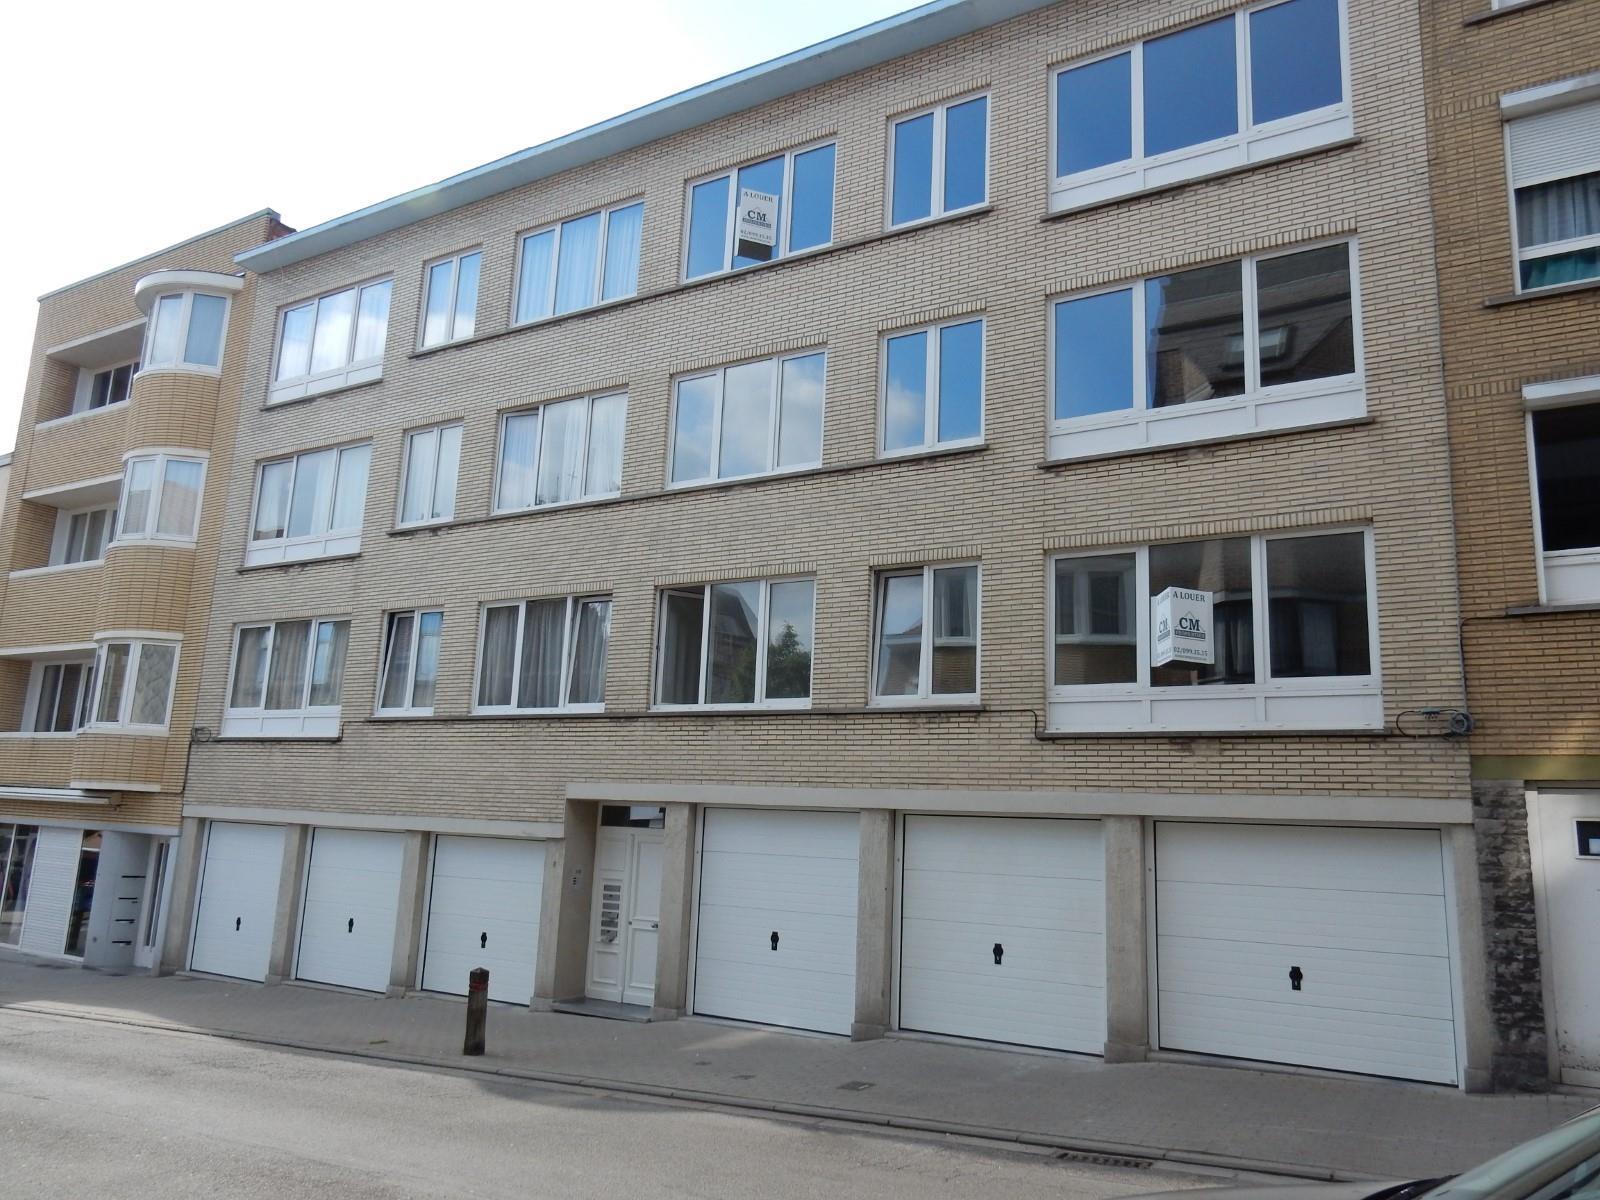 Garage (ferme) - Auderghem - #3974724-1